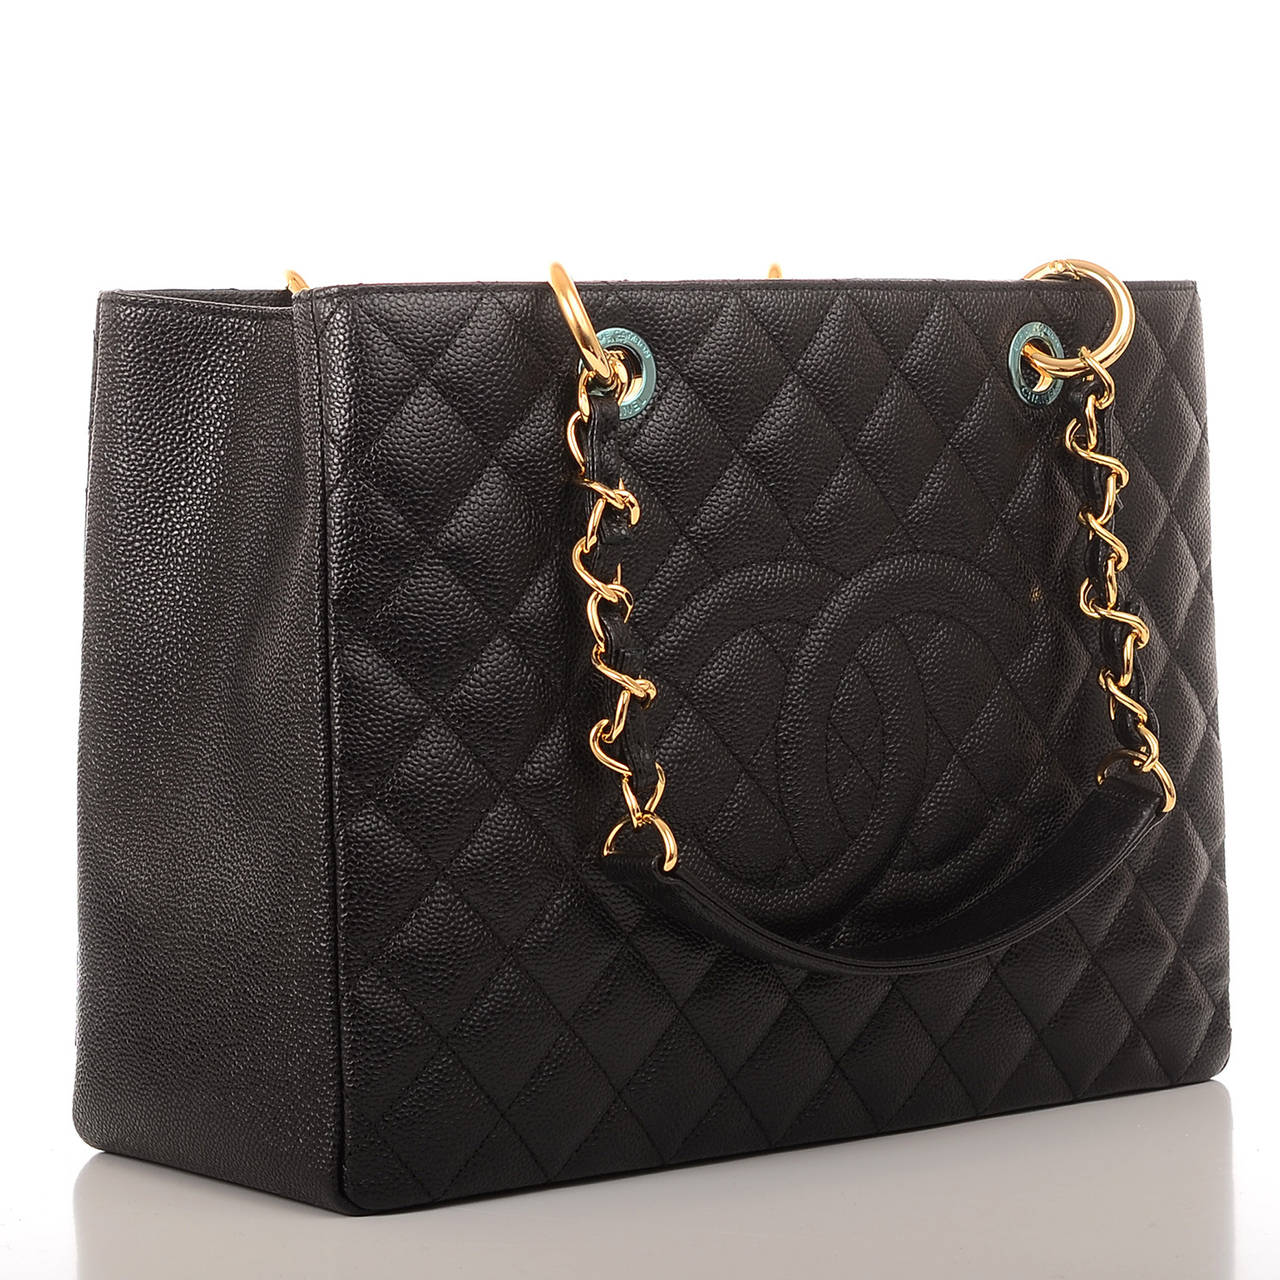 chanel black quilted caviar grand shopper tote gst bag at 1stdibs. Black Bedroom Furniture Sets. Home Design Ideas